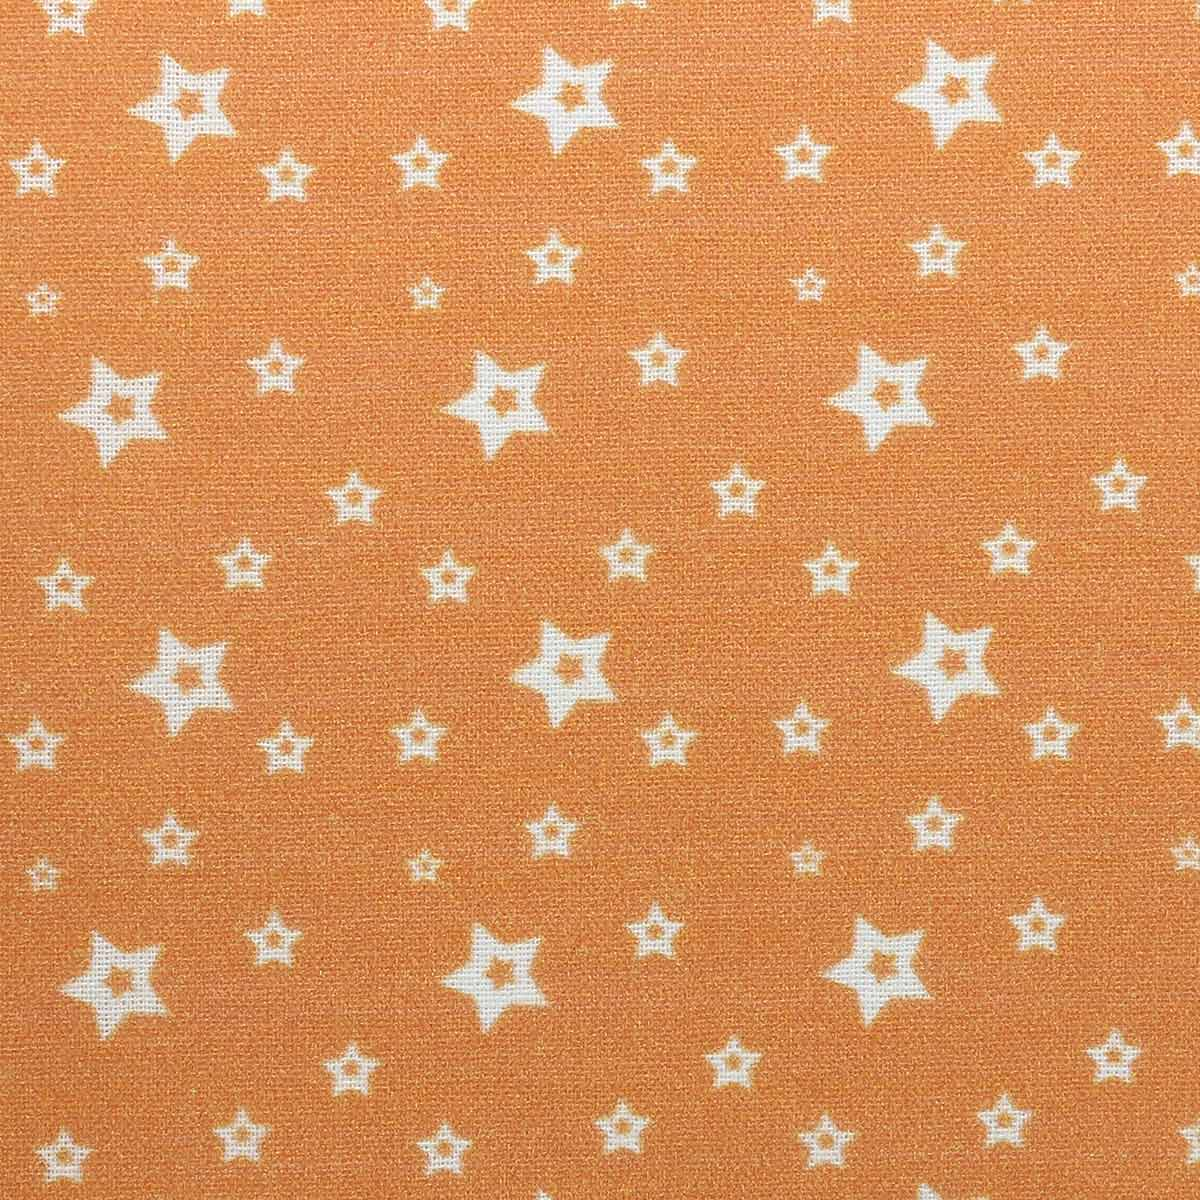 AM575027 Ткань 'Звезды' №27, 100% хлопок, 120 г/м2, размер 48*50см